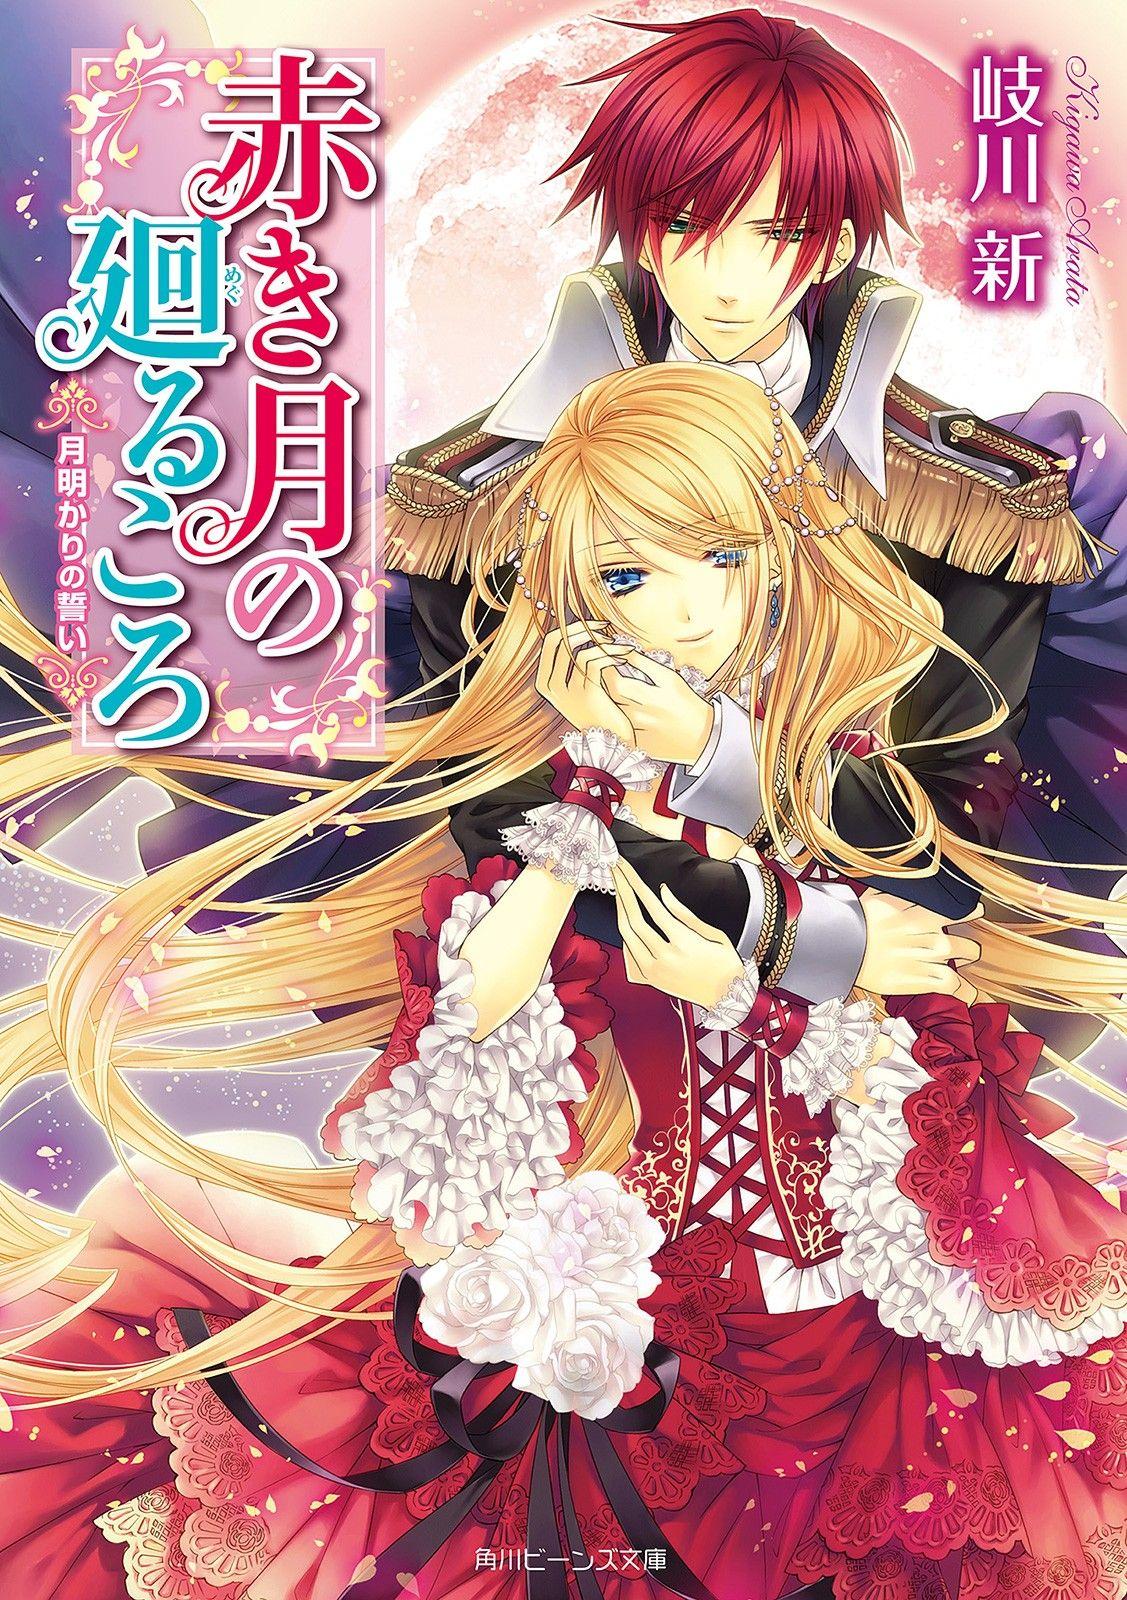 Pin By Sui Kong On Chinese Anime Manga Anime Manga Girl Manga Love